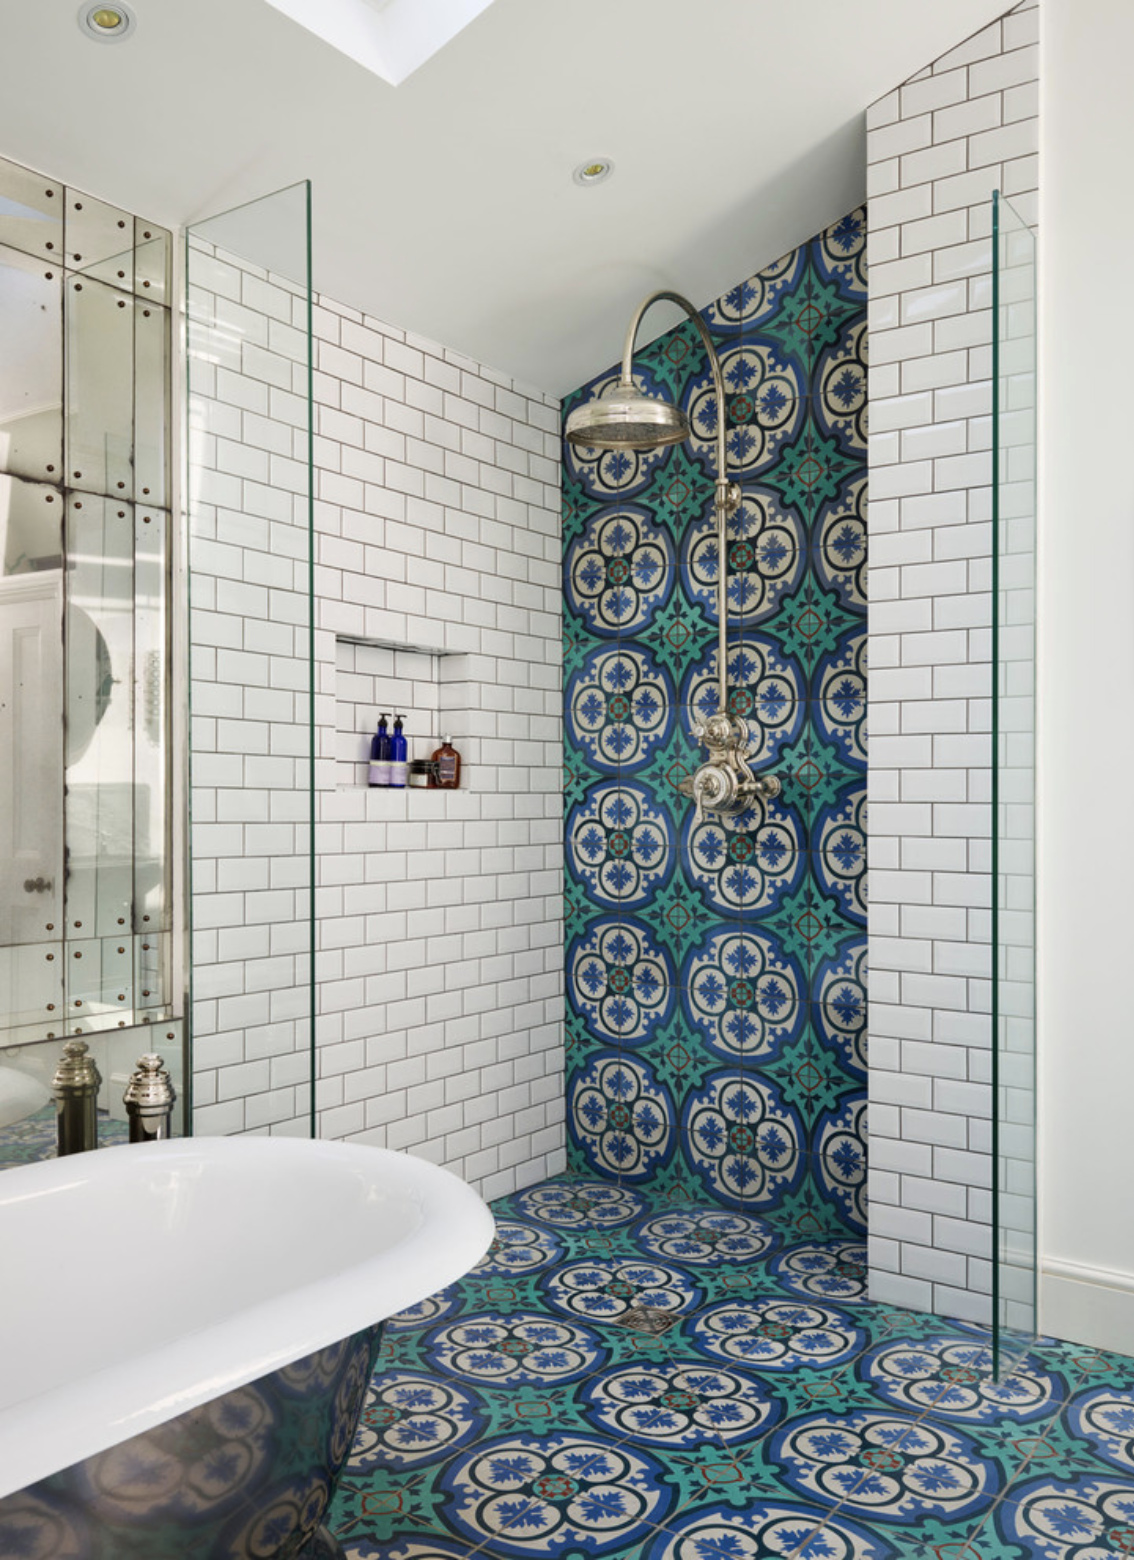 Bathroom Inspiration, Victorian Style Bathroom Floor Tiles